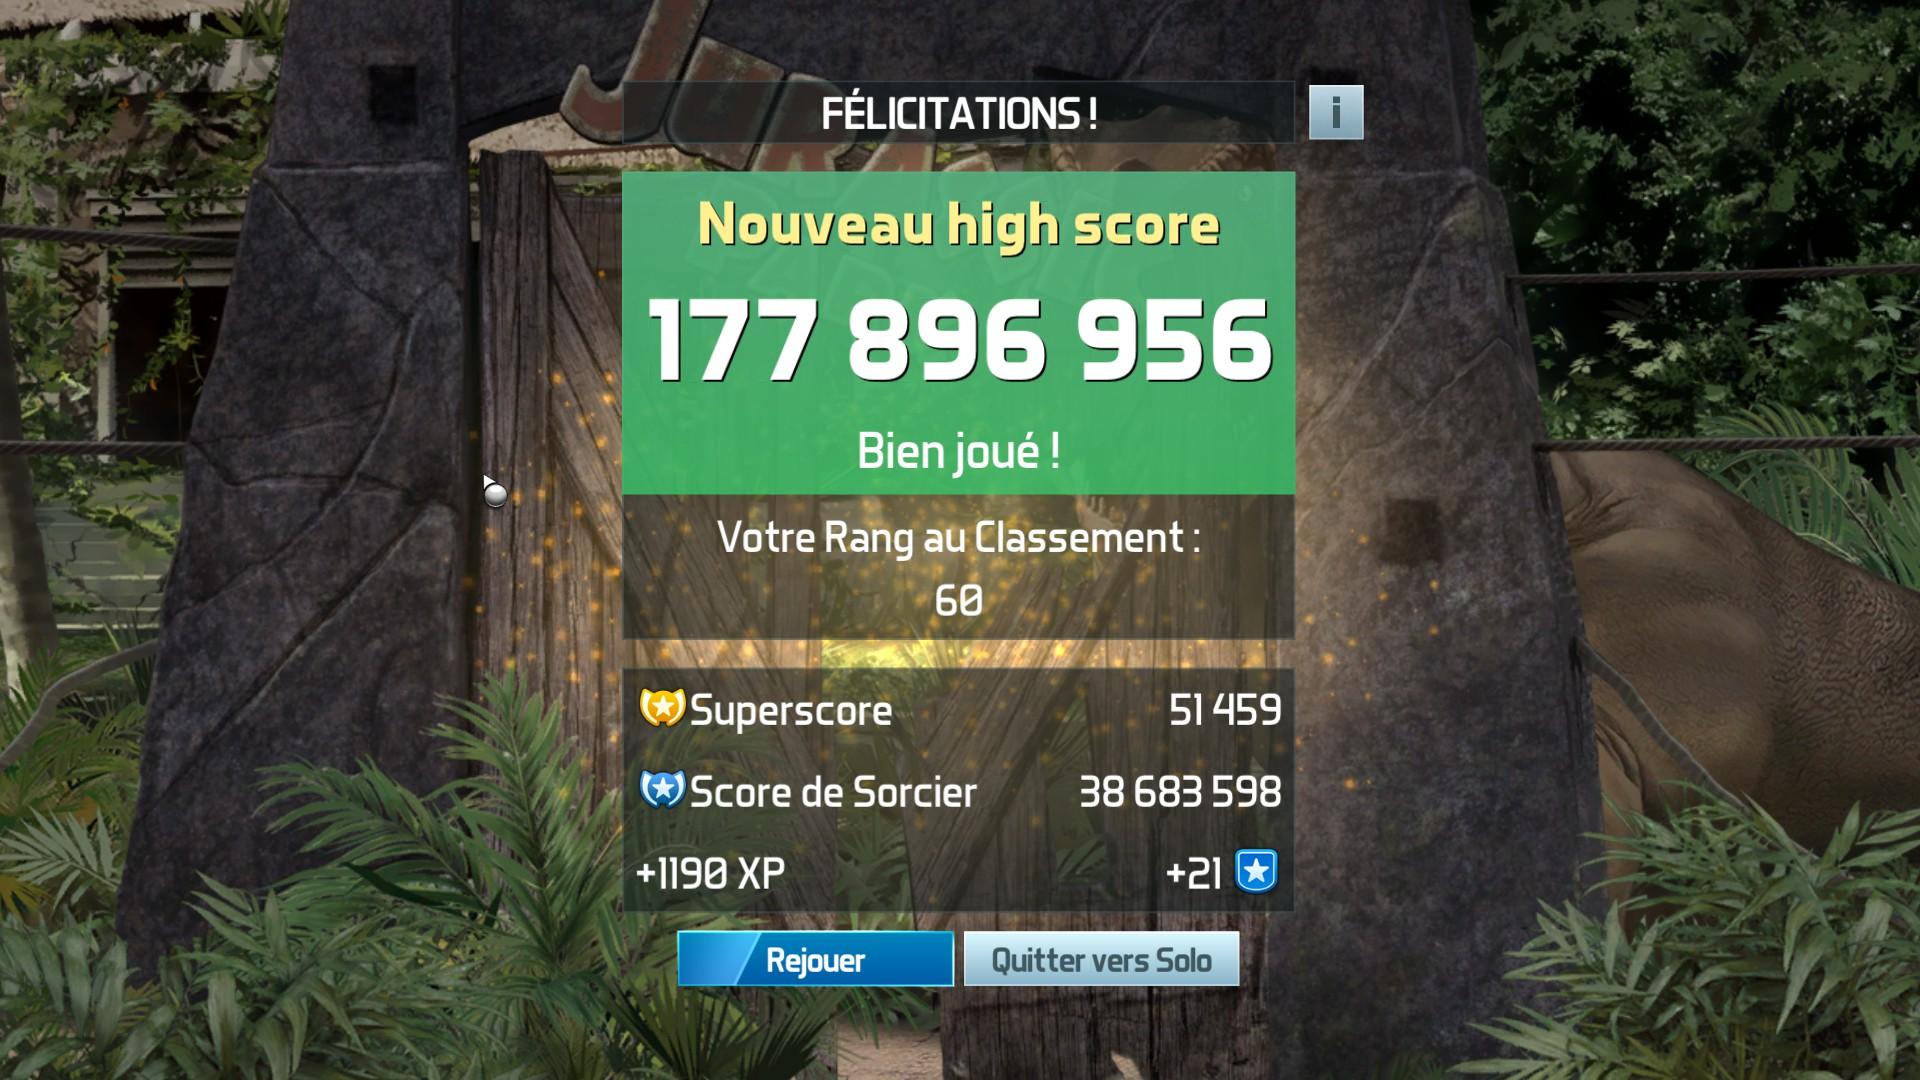 Mantalow: Pinball FX3: Jurassic Park Pinball Mayhem (PC) 177,896,956 points on 2018-02-23 05:10:32